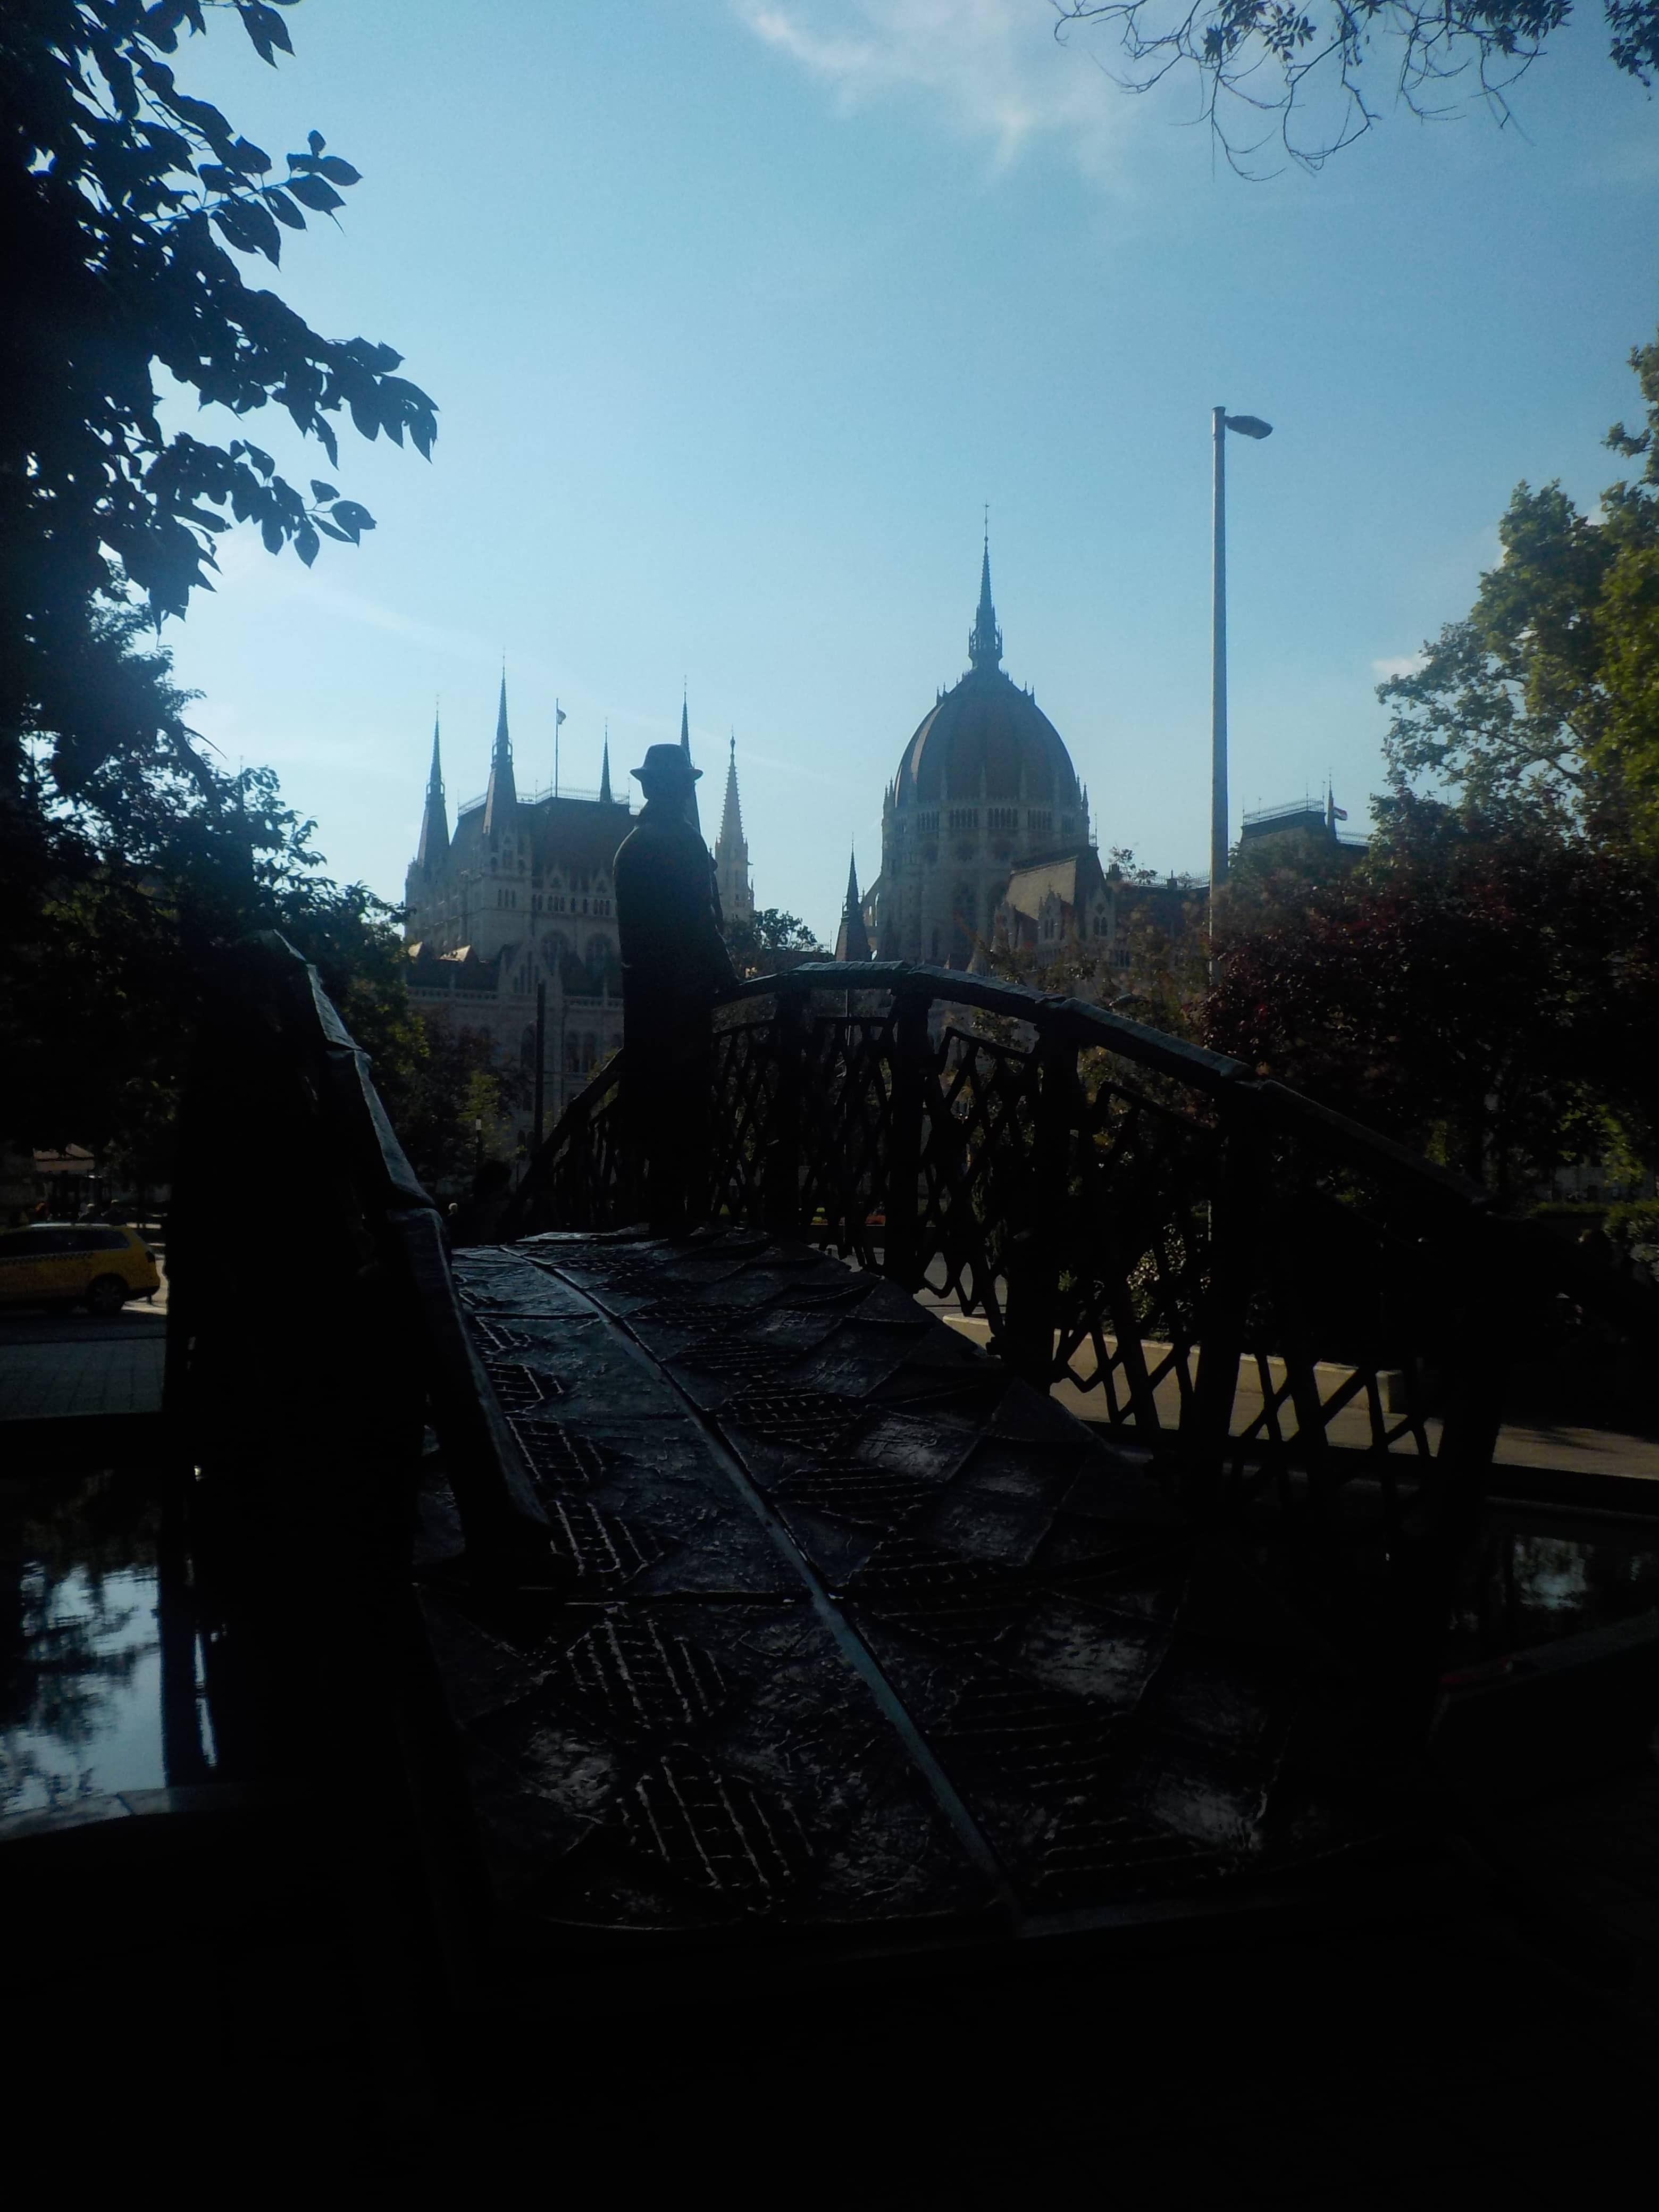 En direction du Parlement